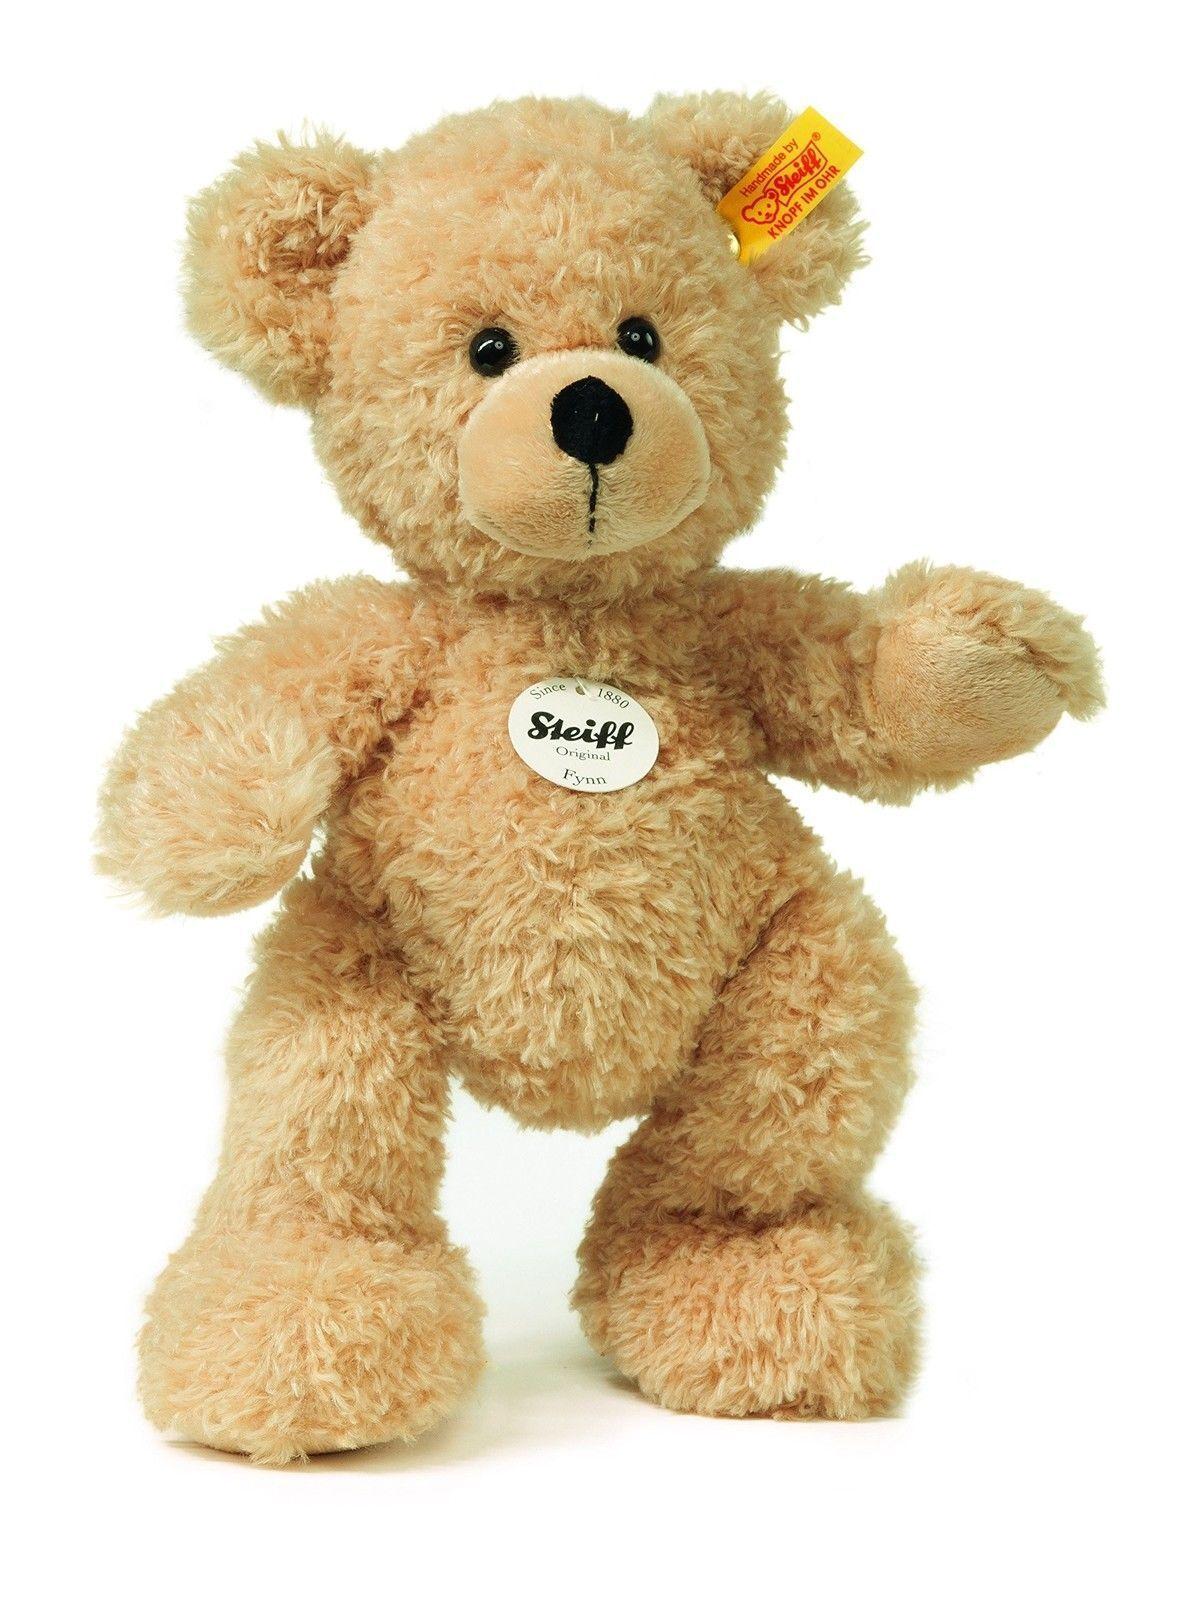 Steiff Fynn Teddy Bear Beige Medium with Free Steiff gift box EAN 111327